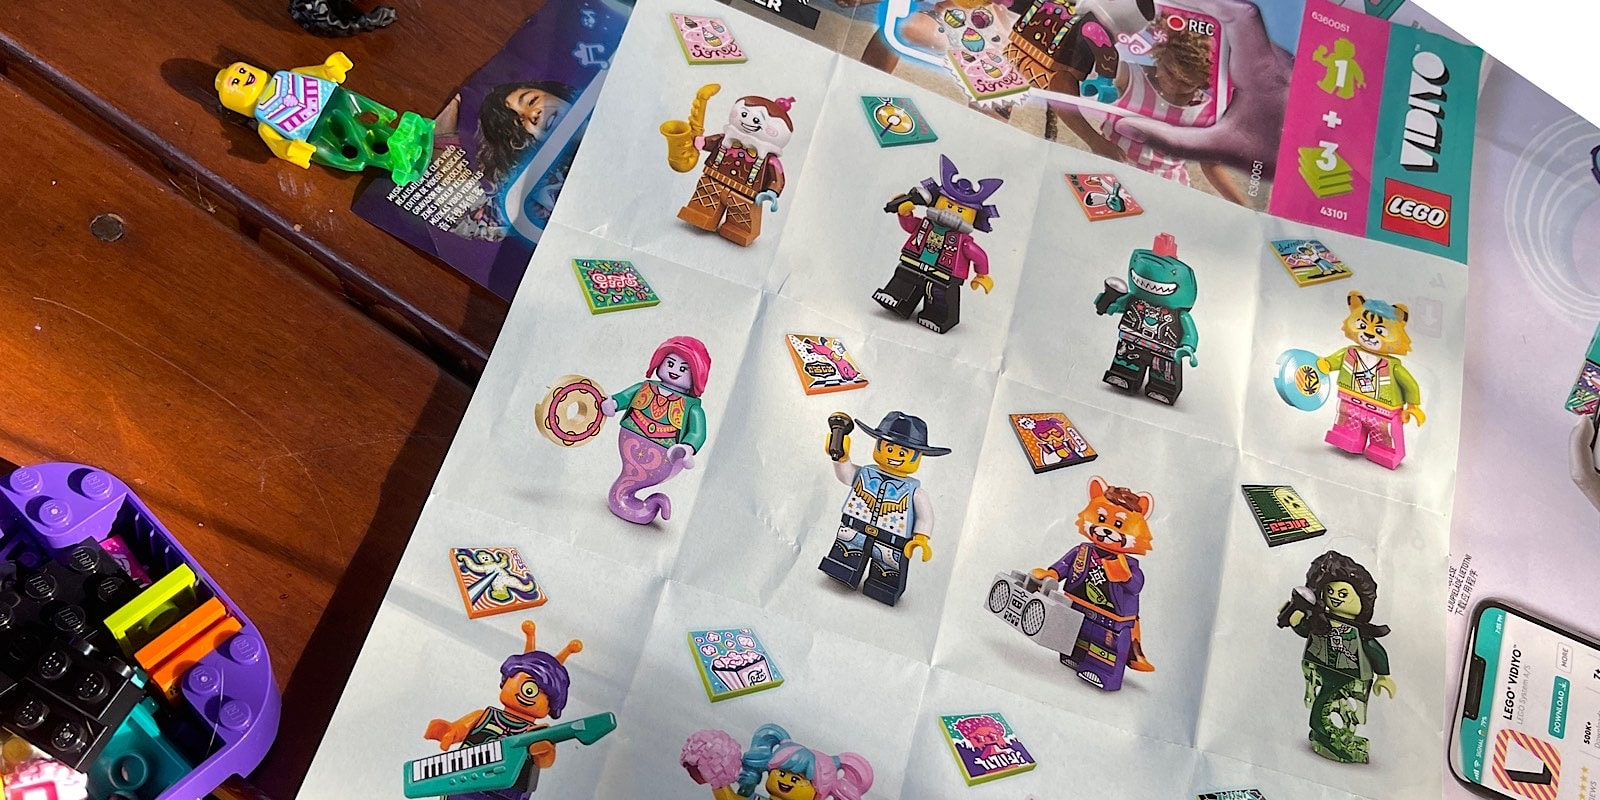 The assortment of Lego Vidiyo toys